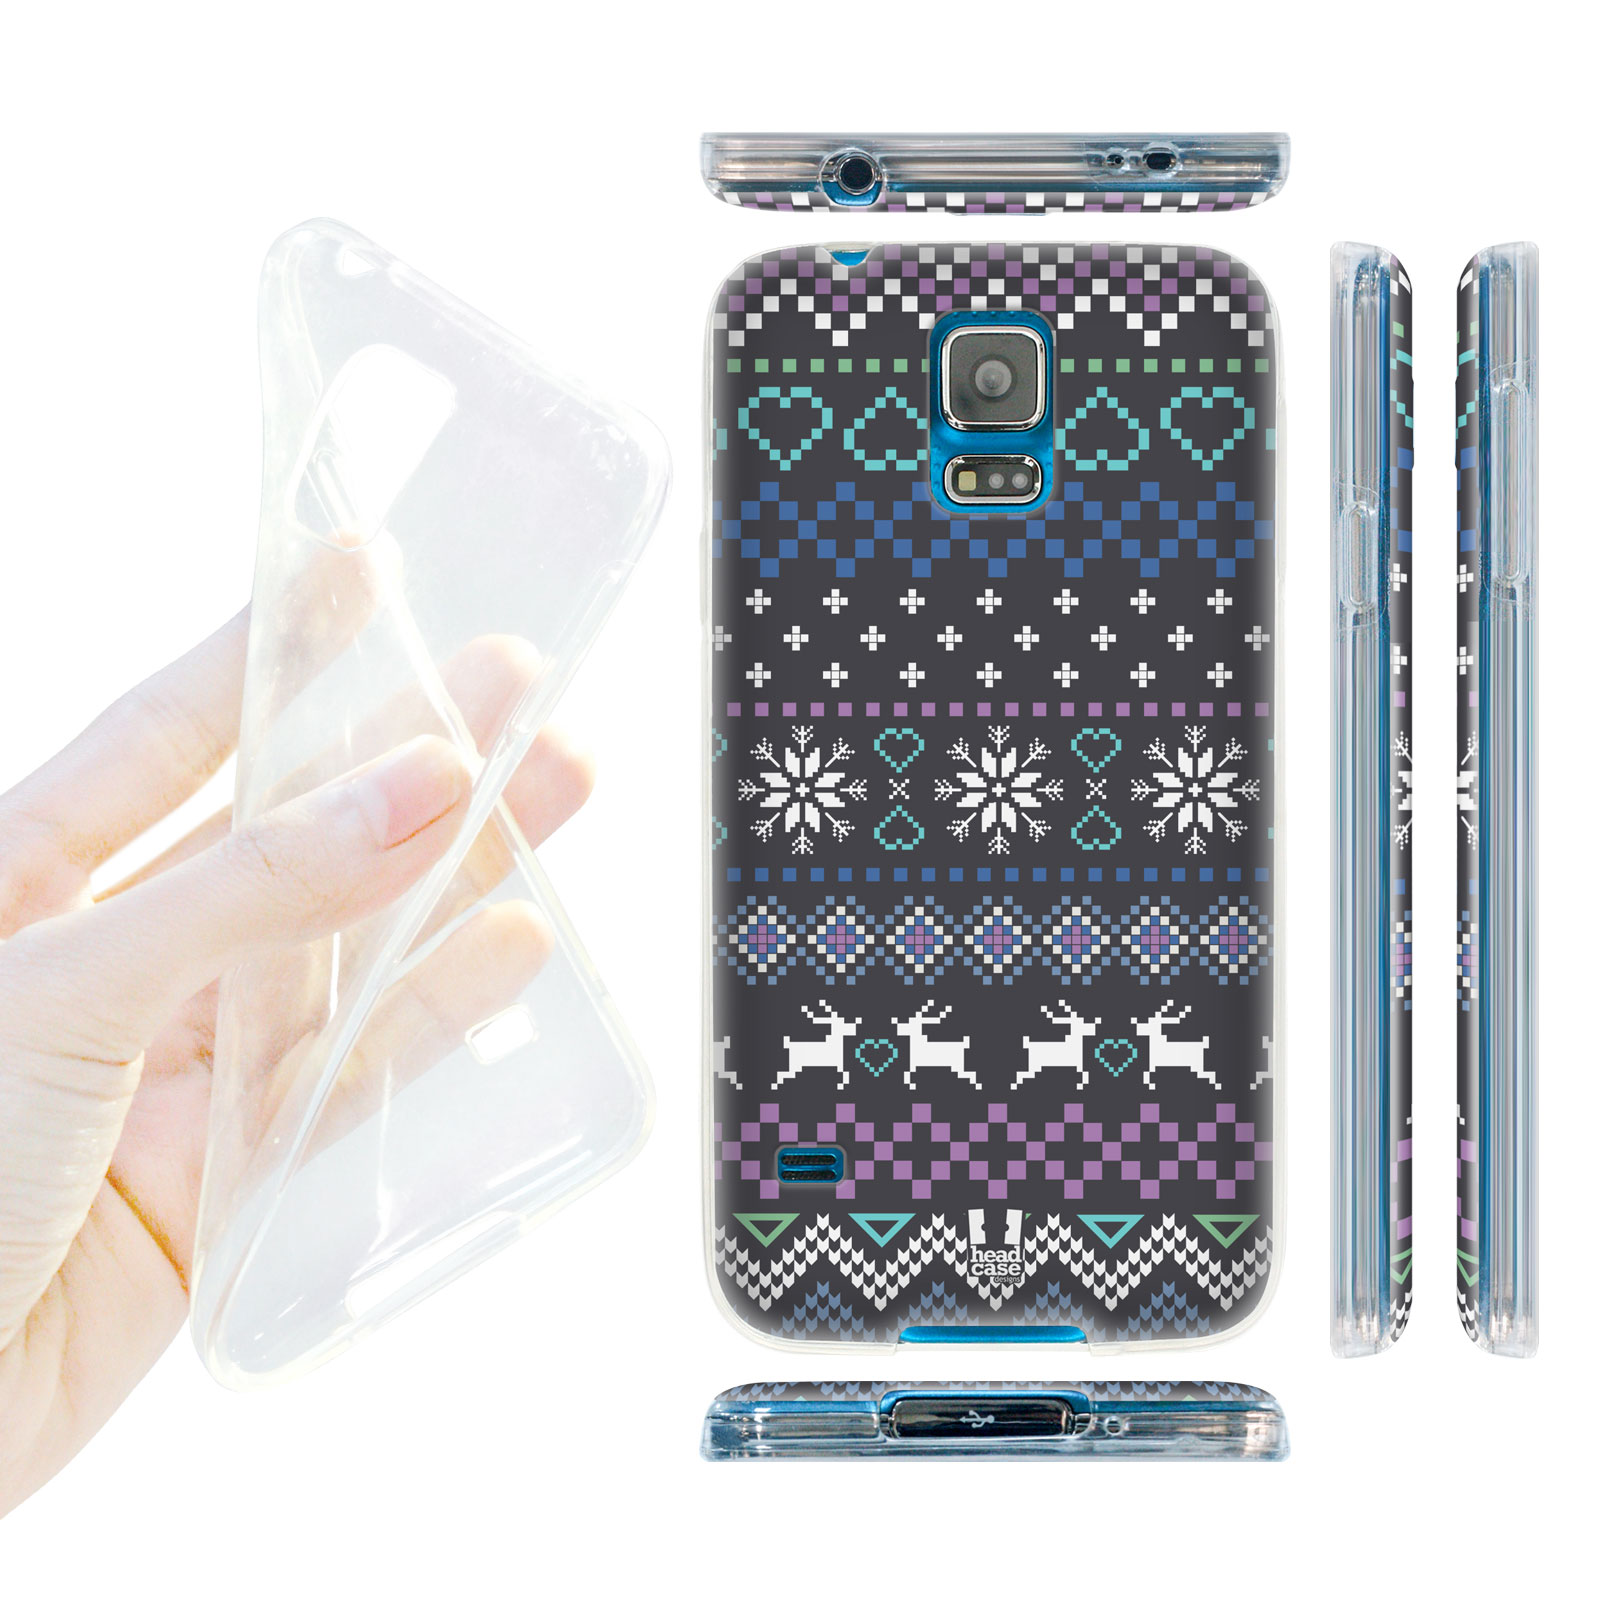 e71062372 HEAD CASE silikonový obal na mobil Samsung galaxy S5 zimní motiv barevný